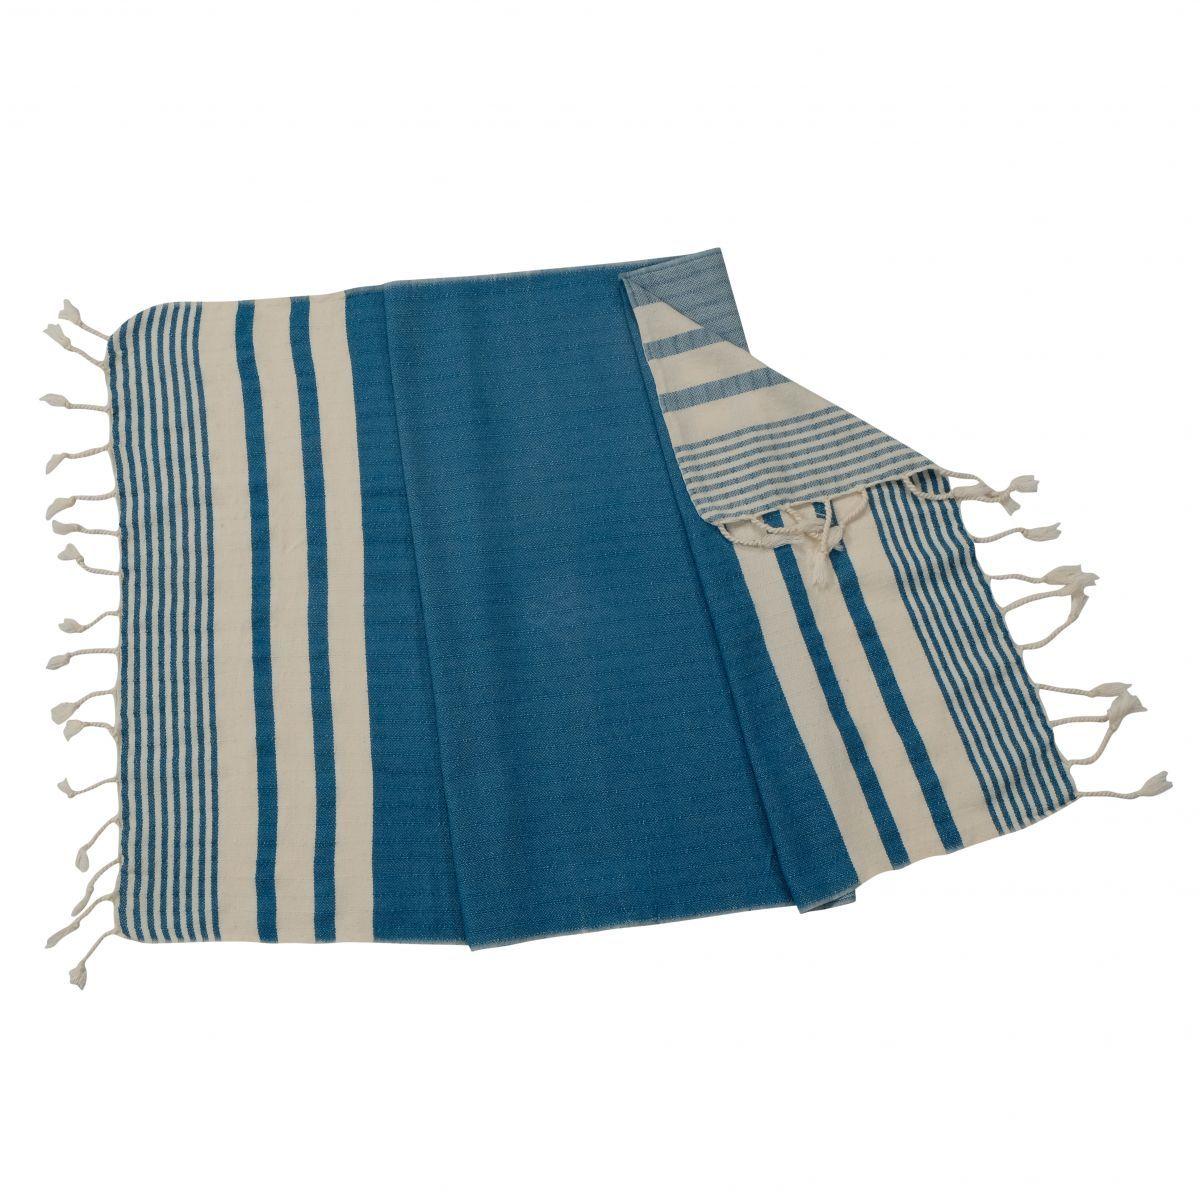 Peshir Tabiat - Petrol Blue